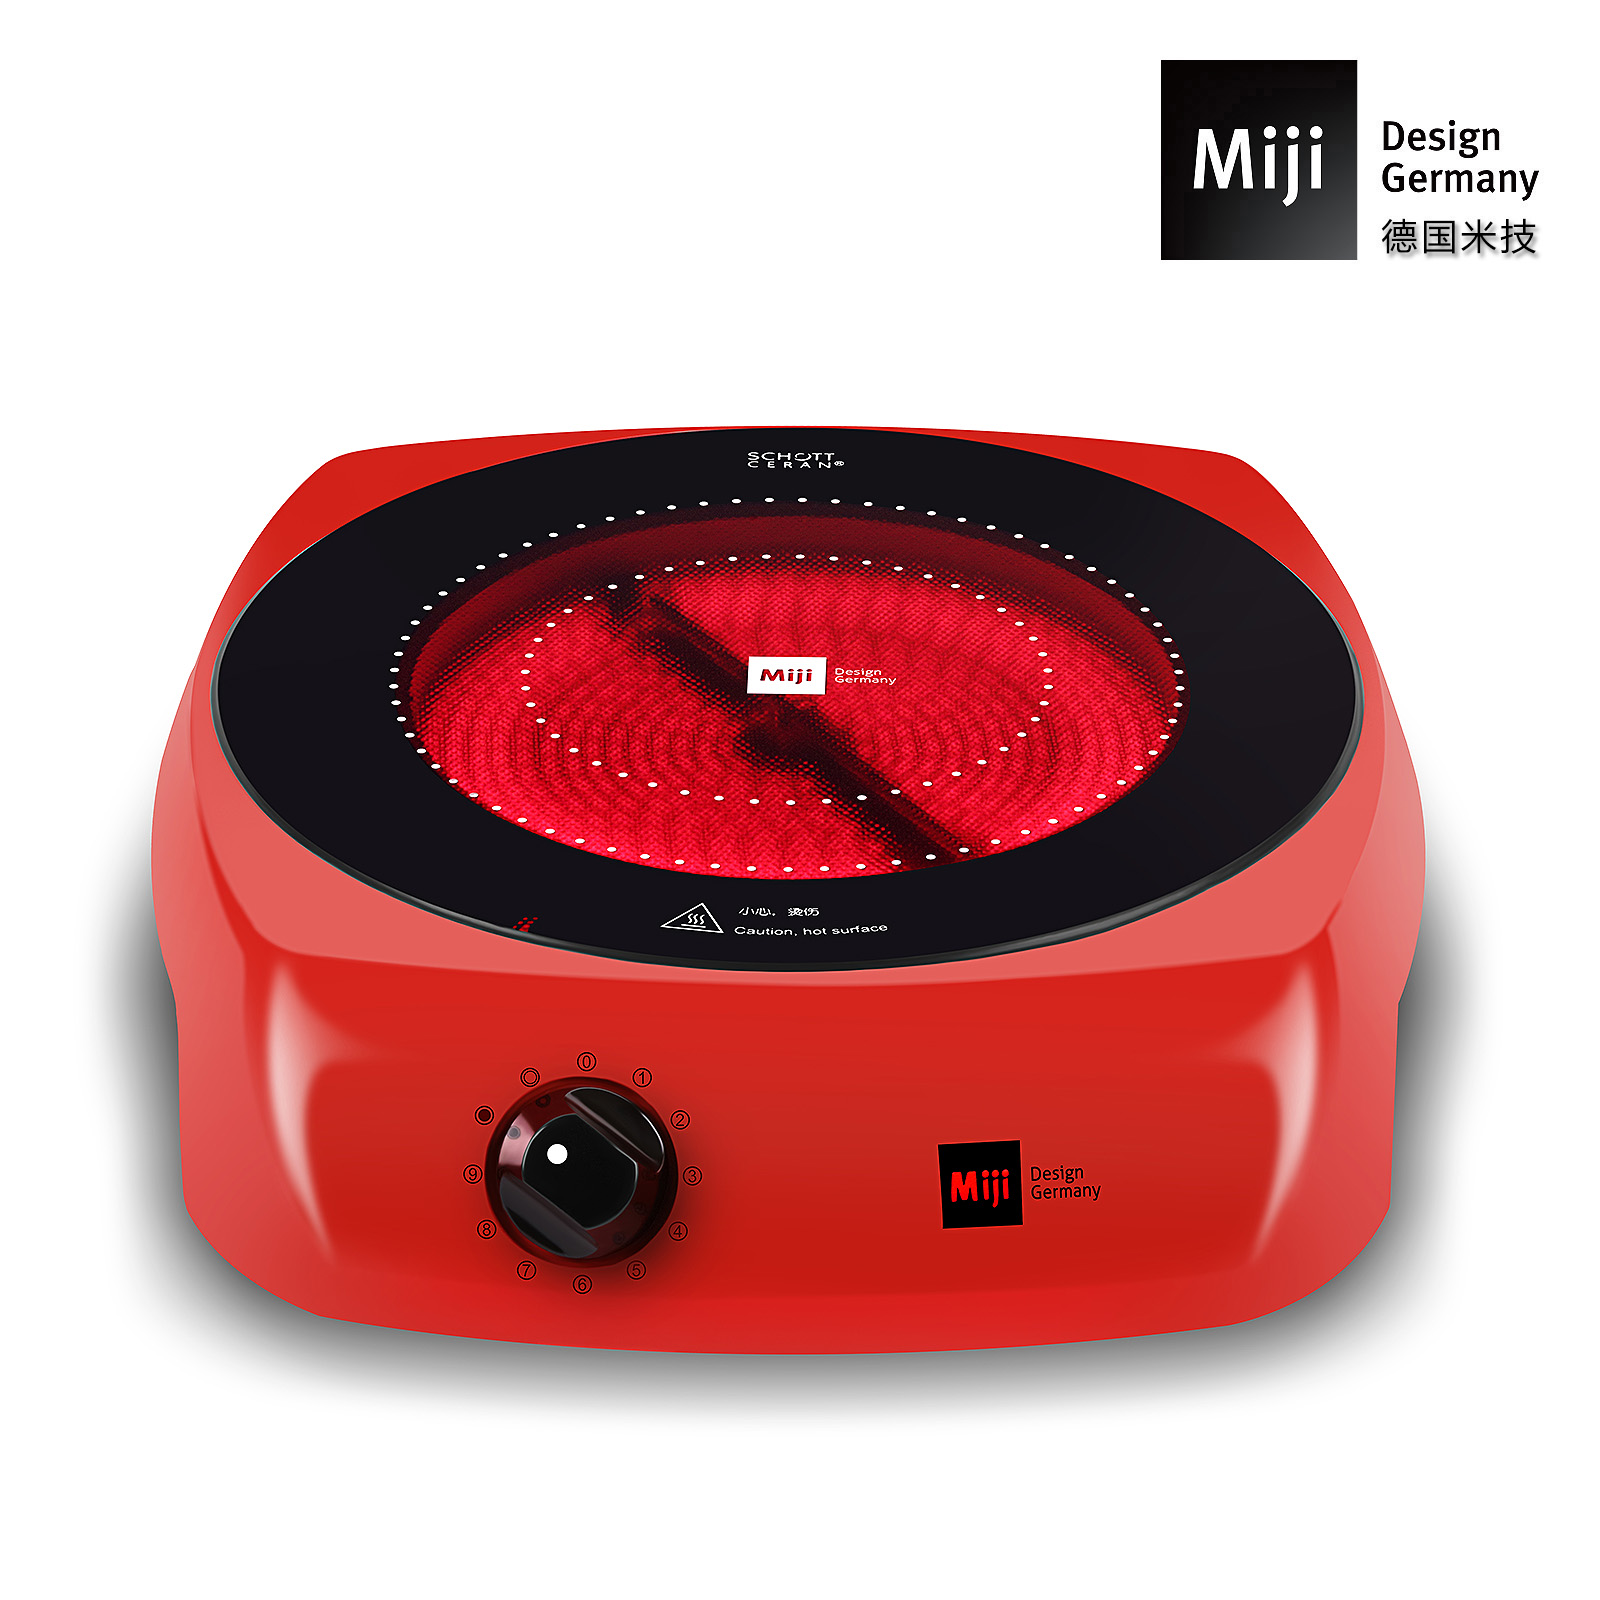 MIJI米技1600W 双圈家用电陶炉辐热炉米技养生炉